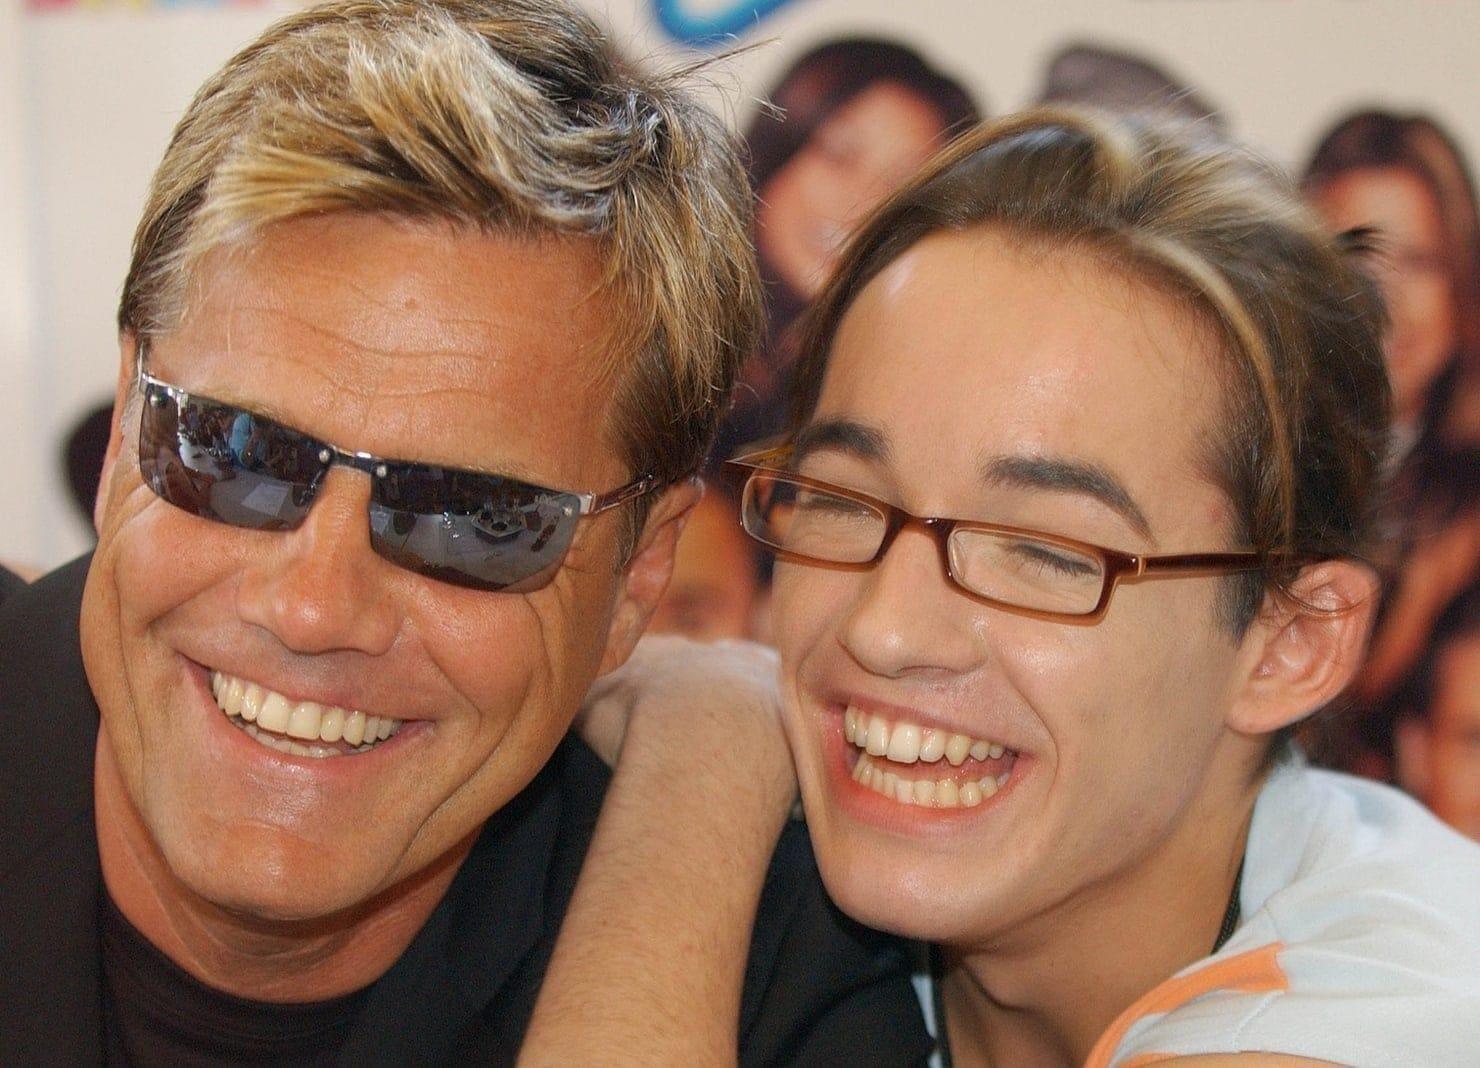 "<p>Ende 2002/Anfang 2003 nahm Daniel Küblböck an der RTL-Castingshow ""Deutschland sucht den Superstar"" teil.&nbsp;</p> Foto: dpa"